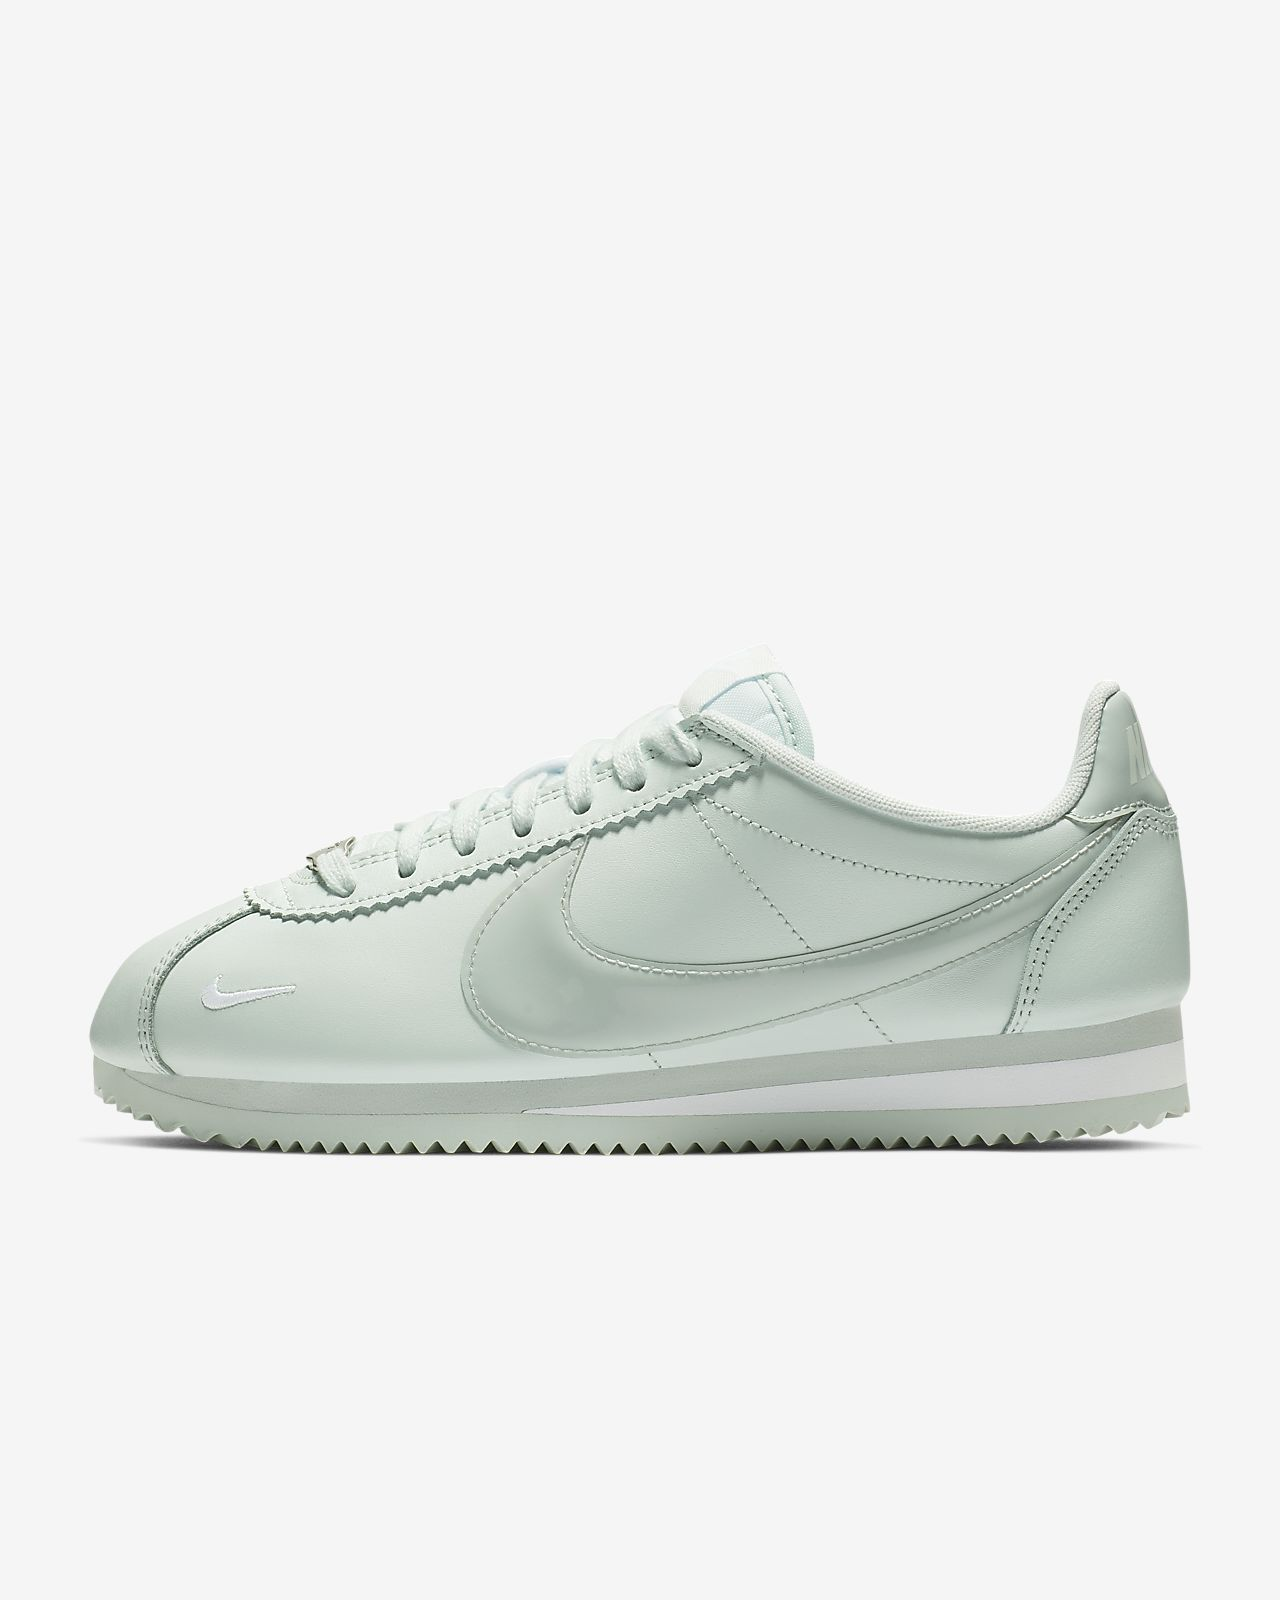 nike scarpe donna 2018 cortez